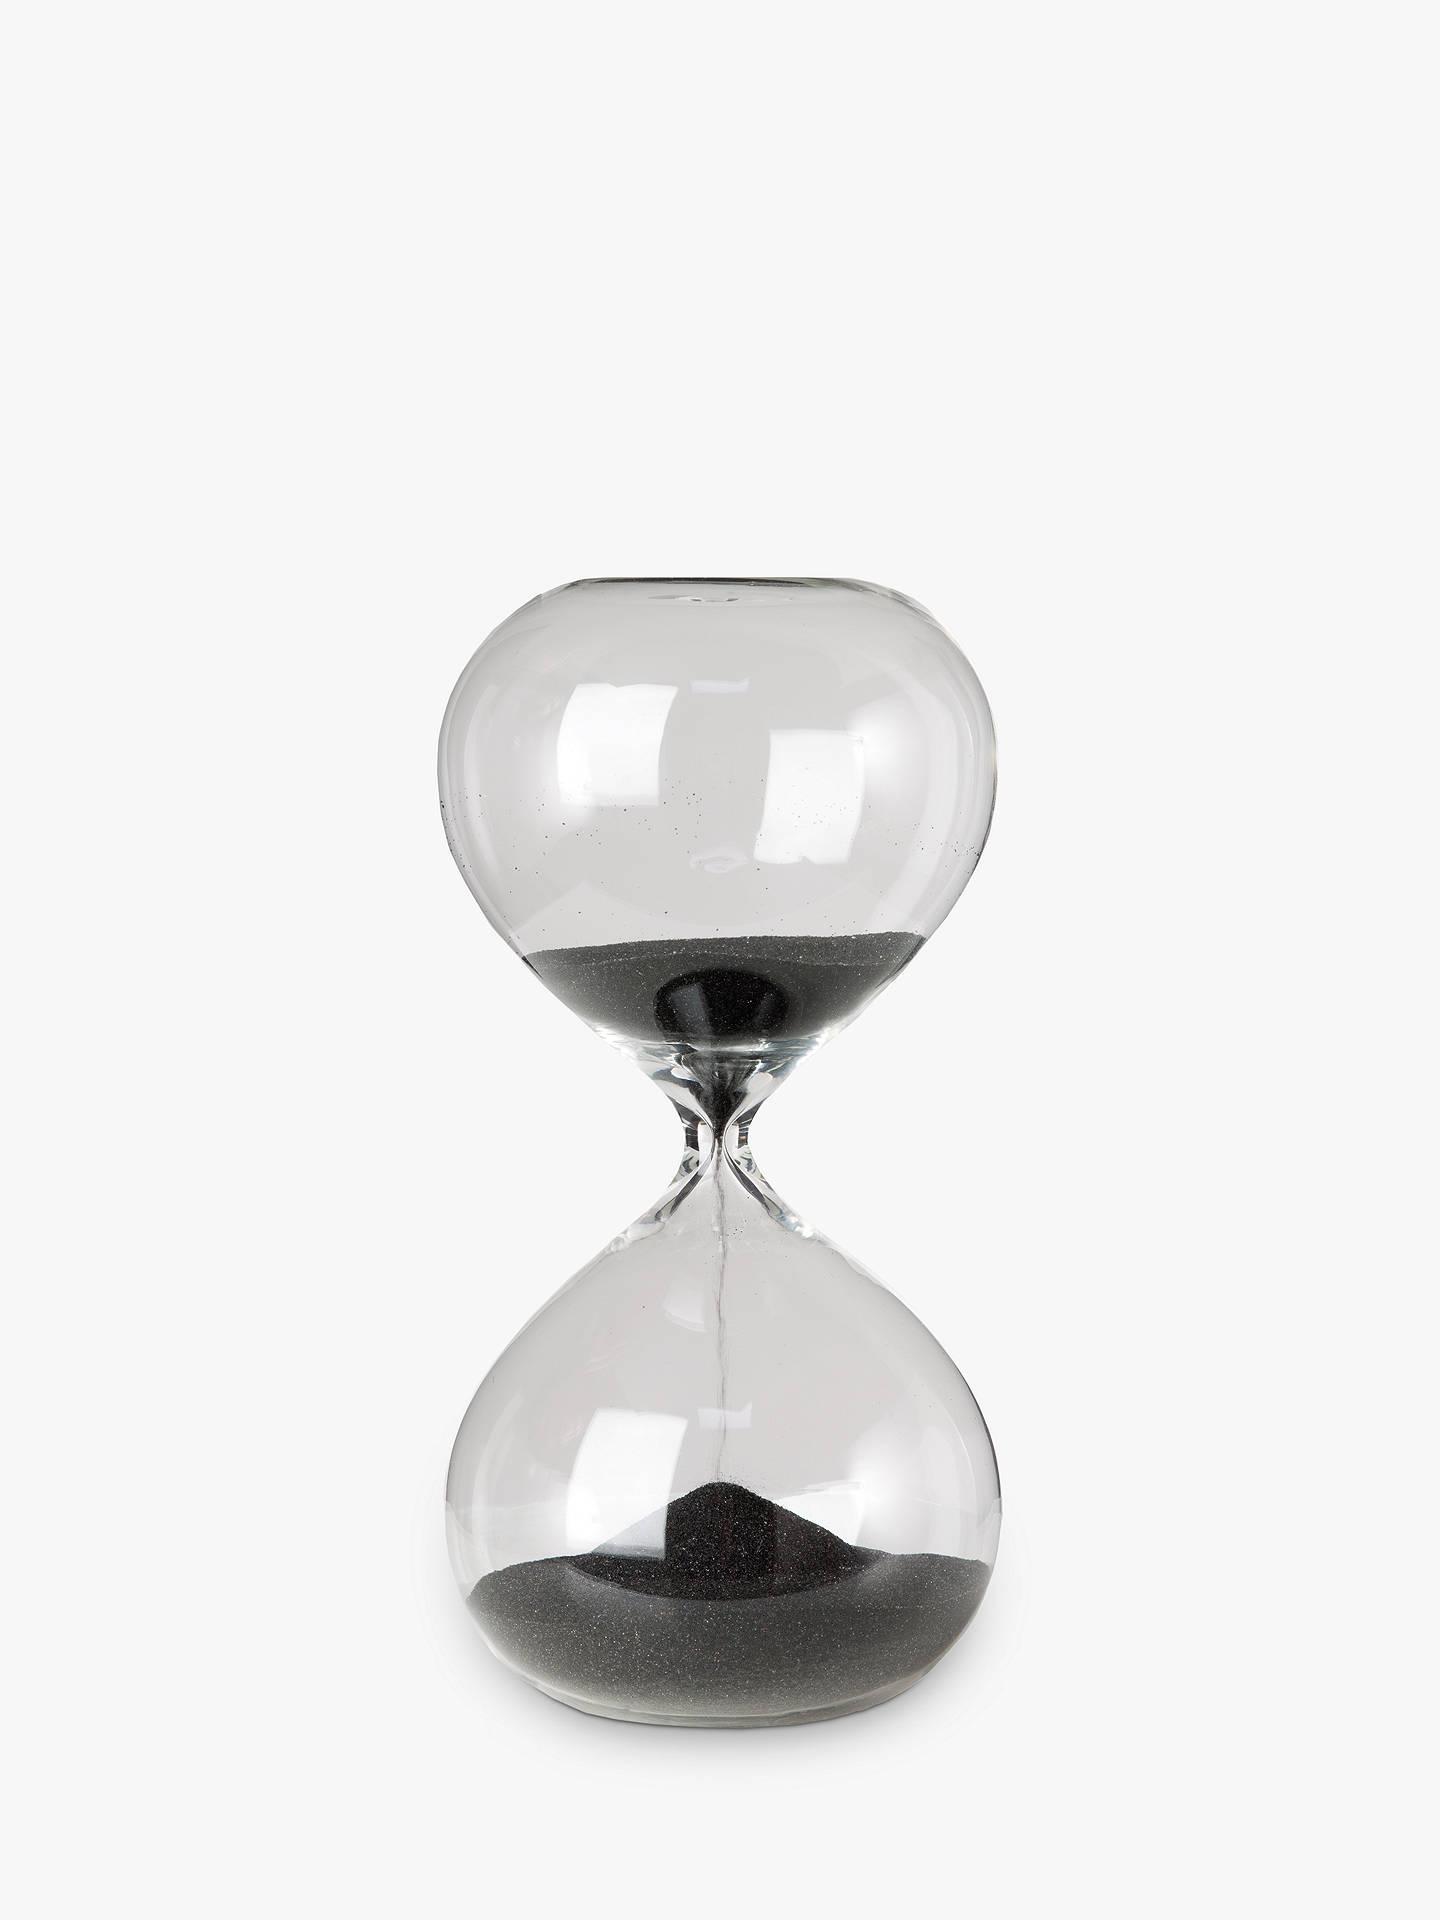 Pols Potten Hourglass Ball Sandglass, Mini, Black by Pols Potten